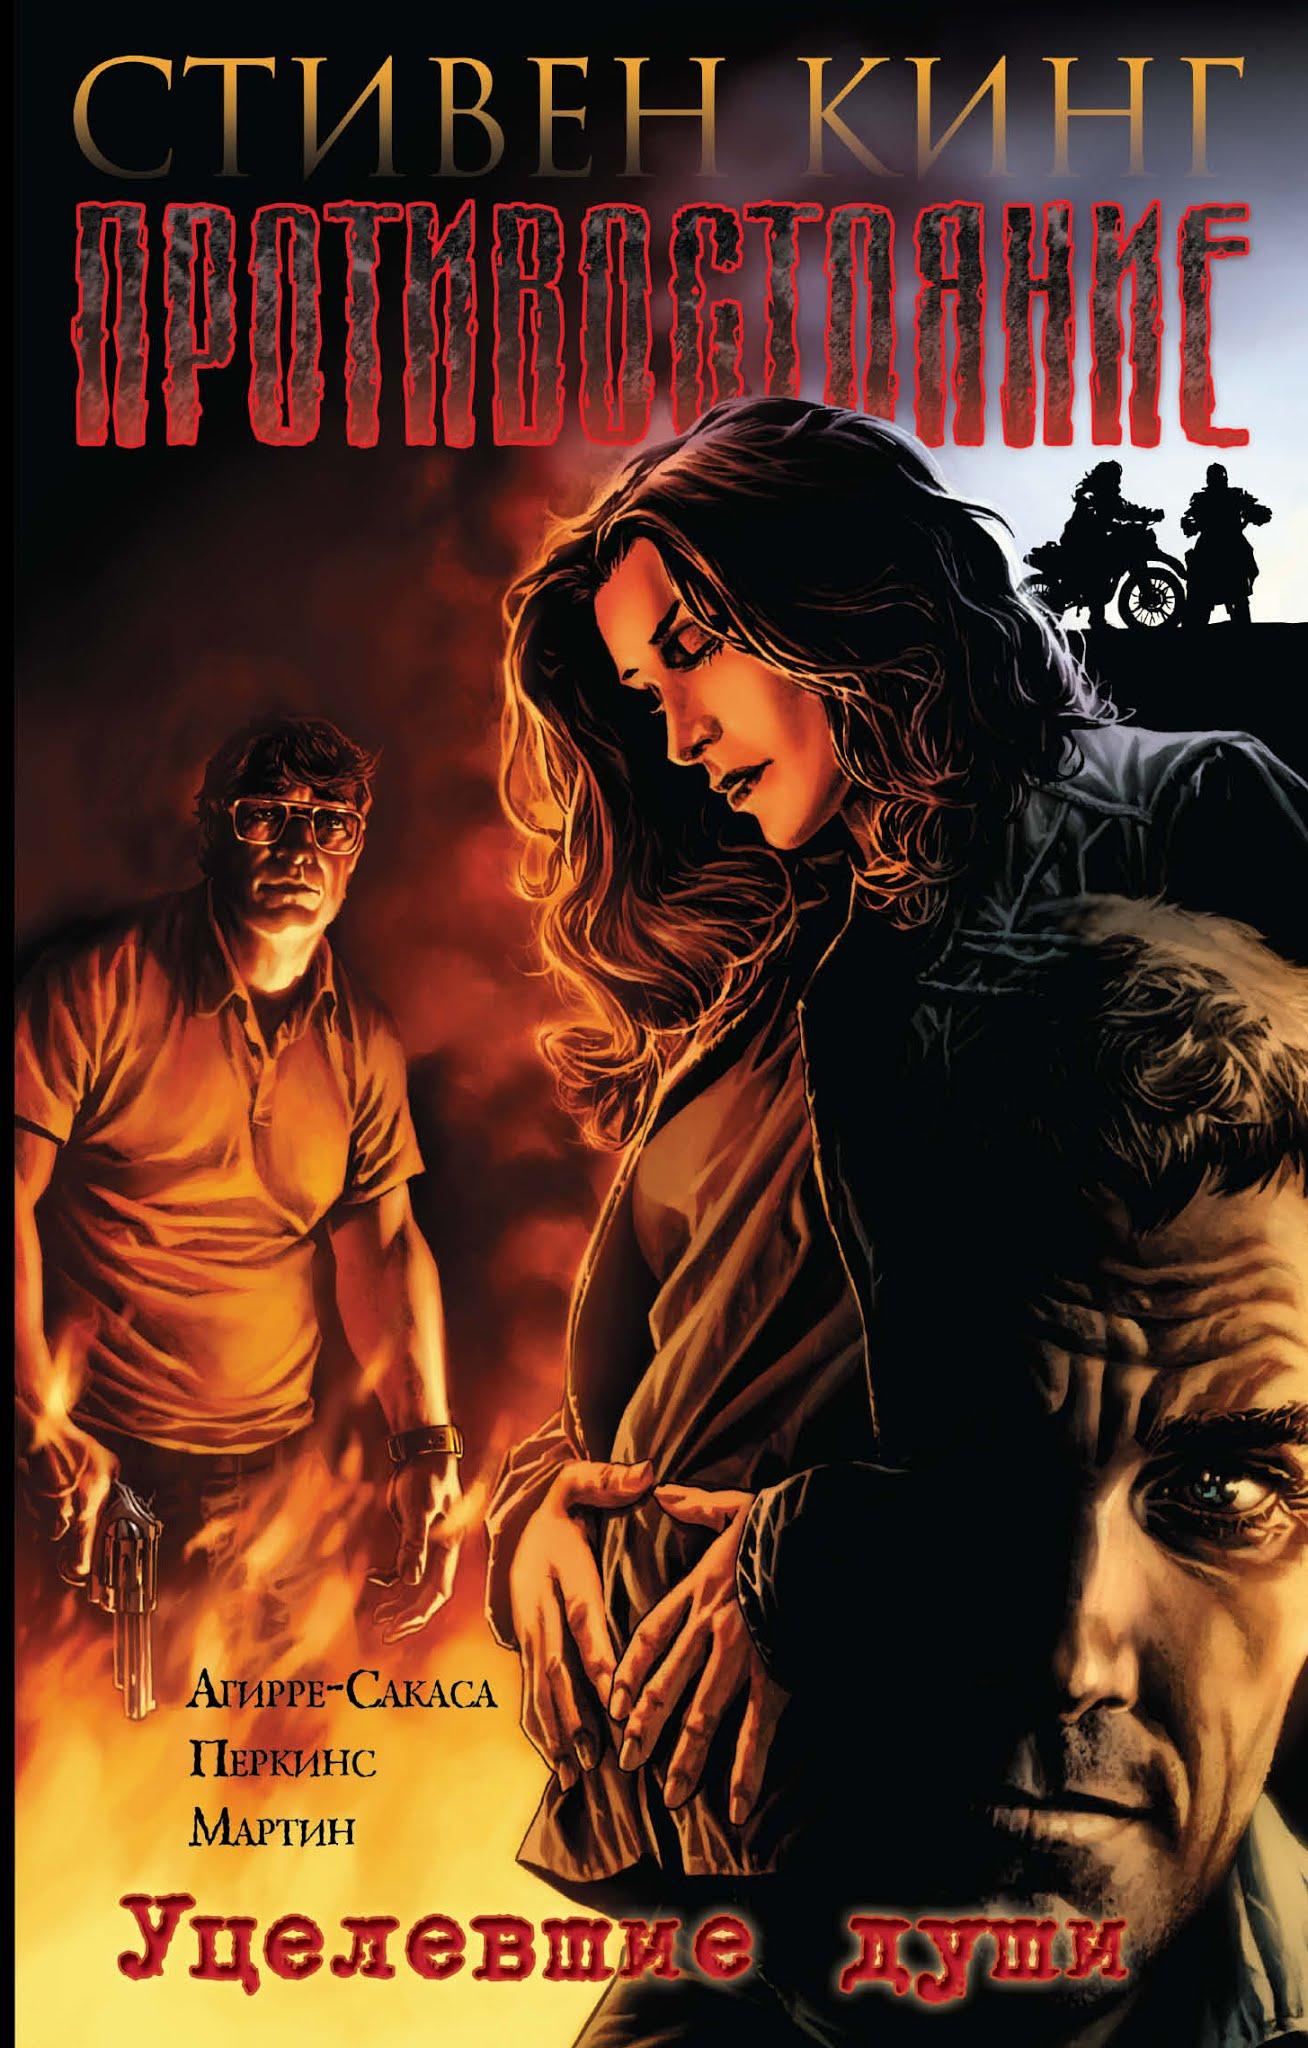 Комикс «Стивен Кинг. Противостояние. Уцелевшие души» (2010)